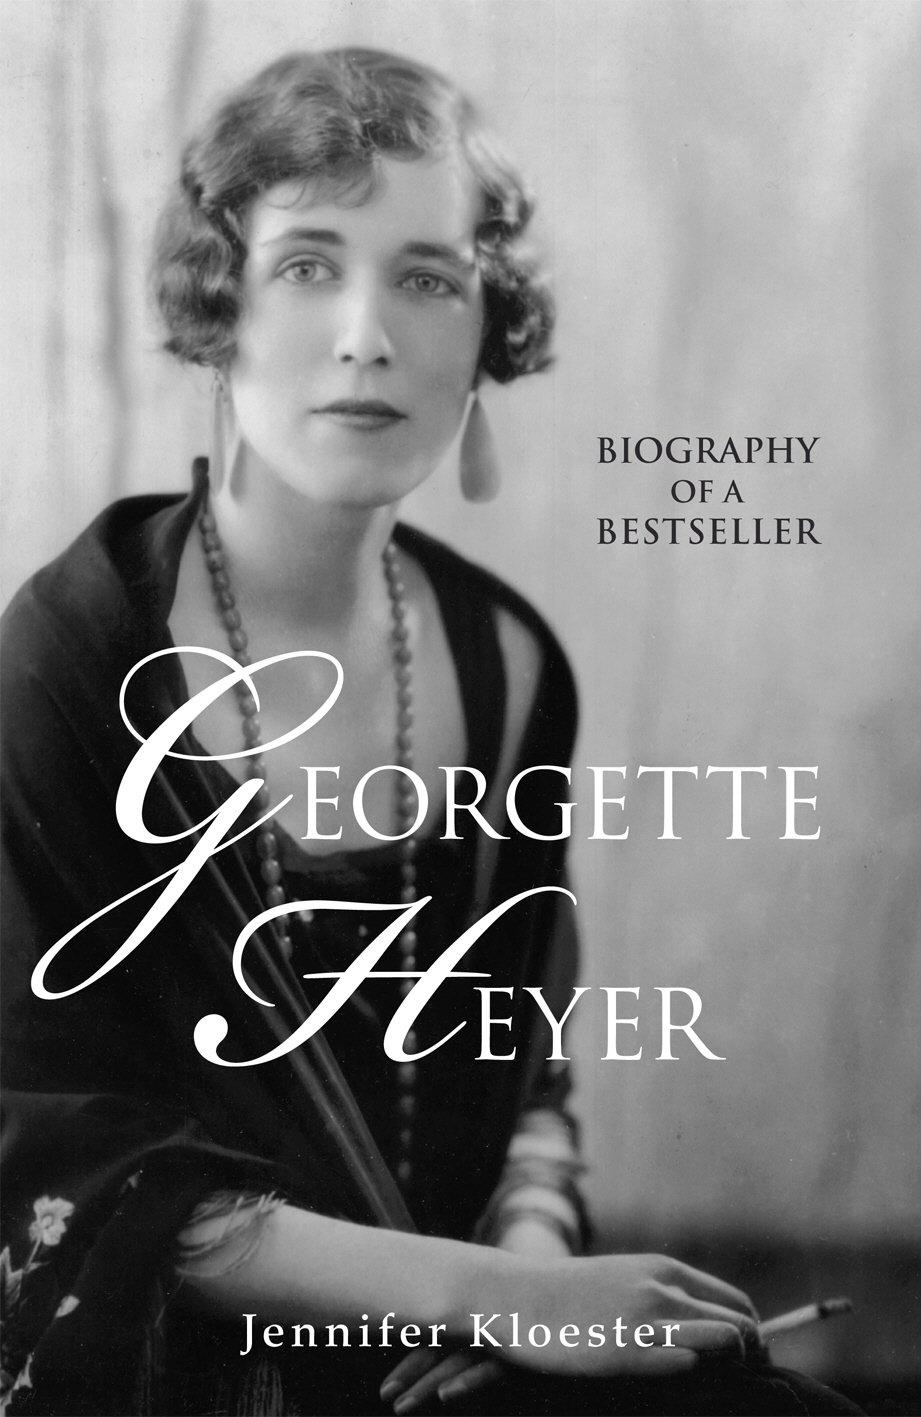 Georgette Heyer: Biography of a Bestseller by William Heinemann (Image #1)